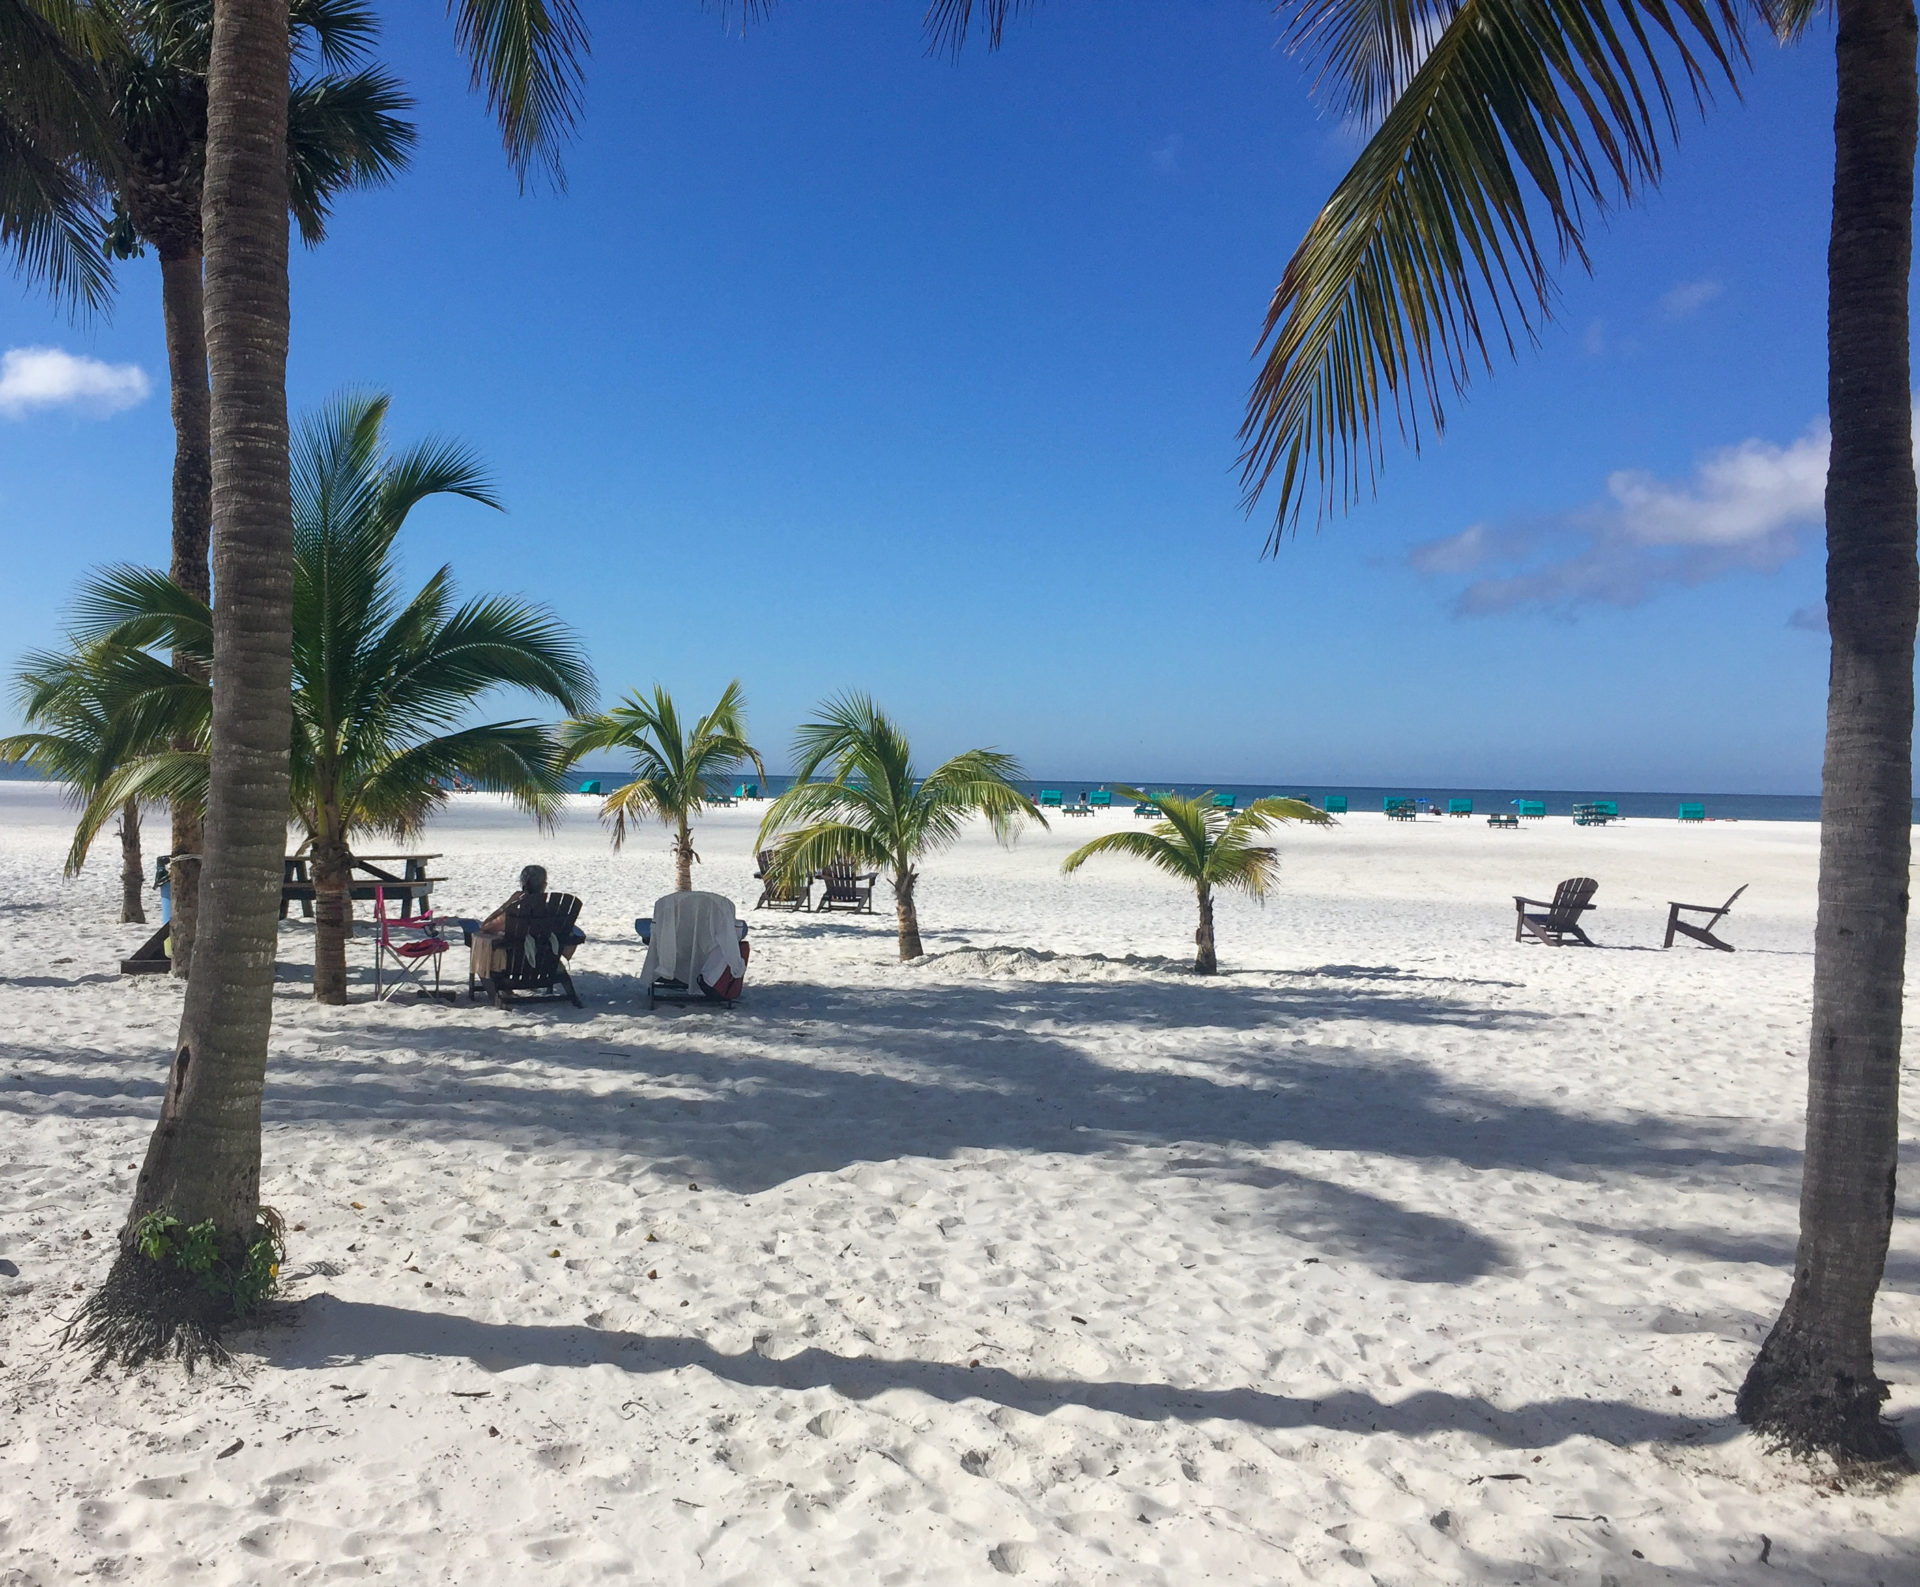 Strand mit Palmen in Fort Myers Beach in Florida